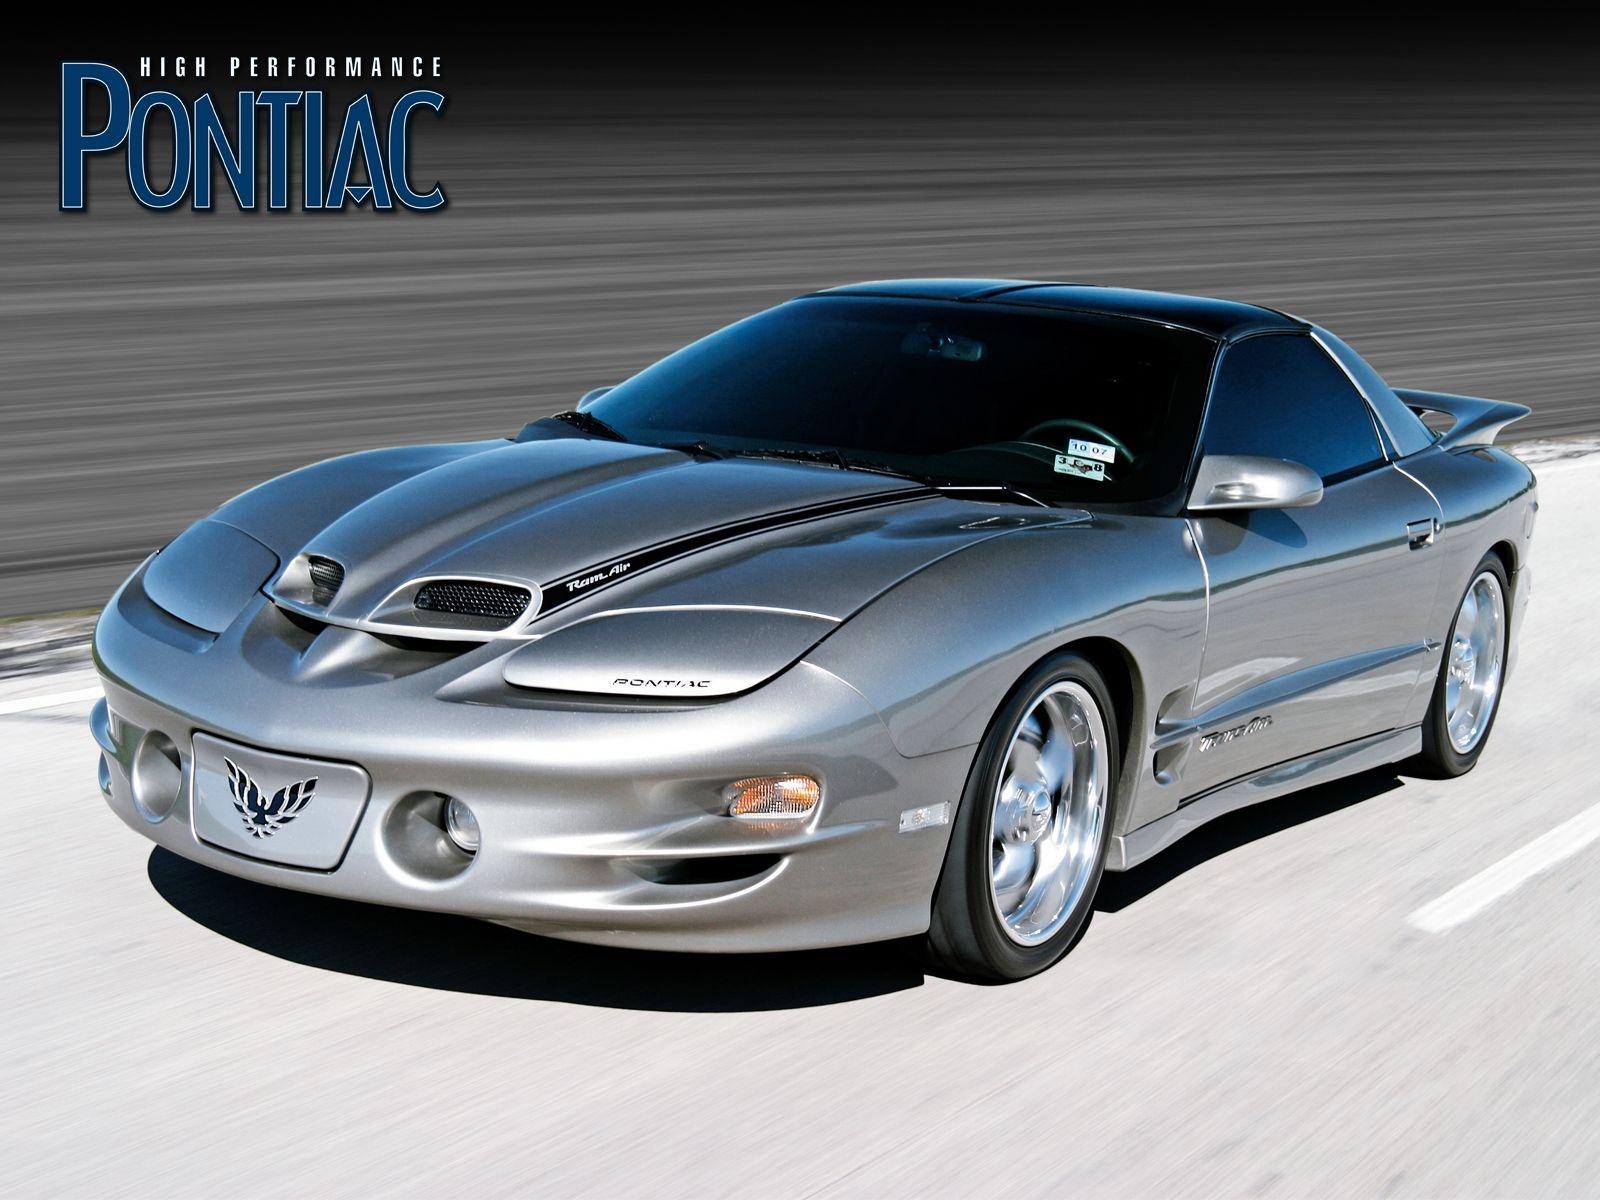 1998 pontiac firebird trans am ram air best quality free high resolution car pictures